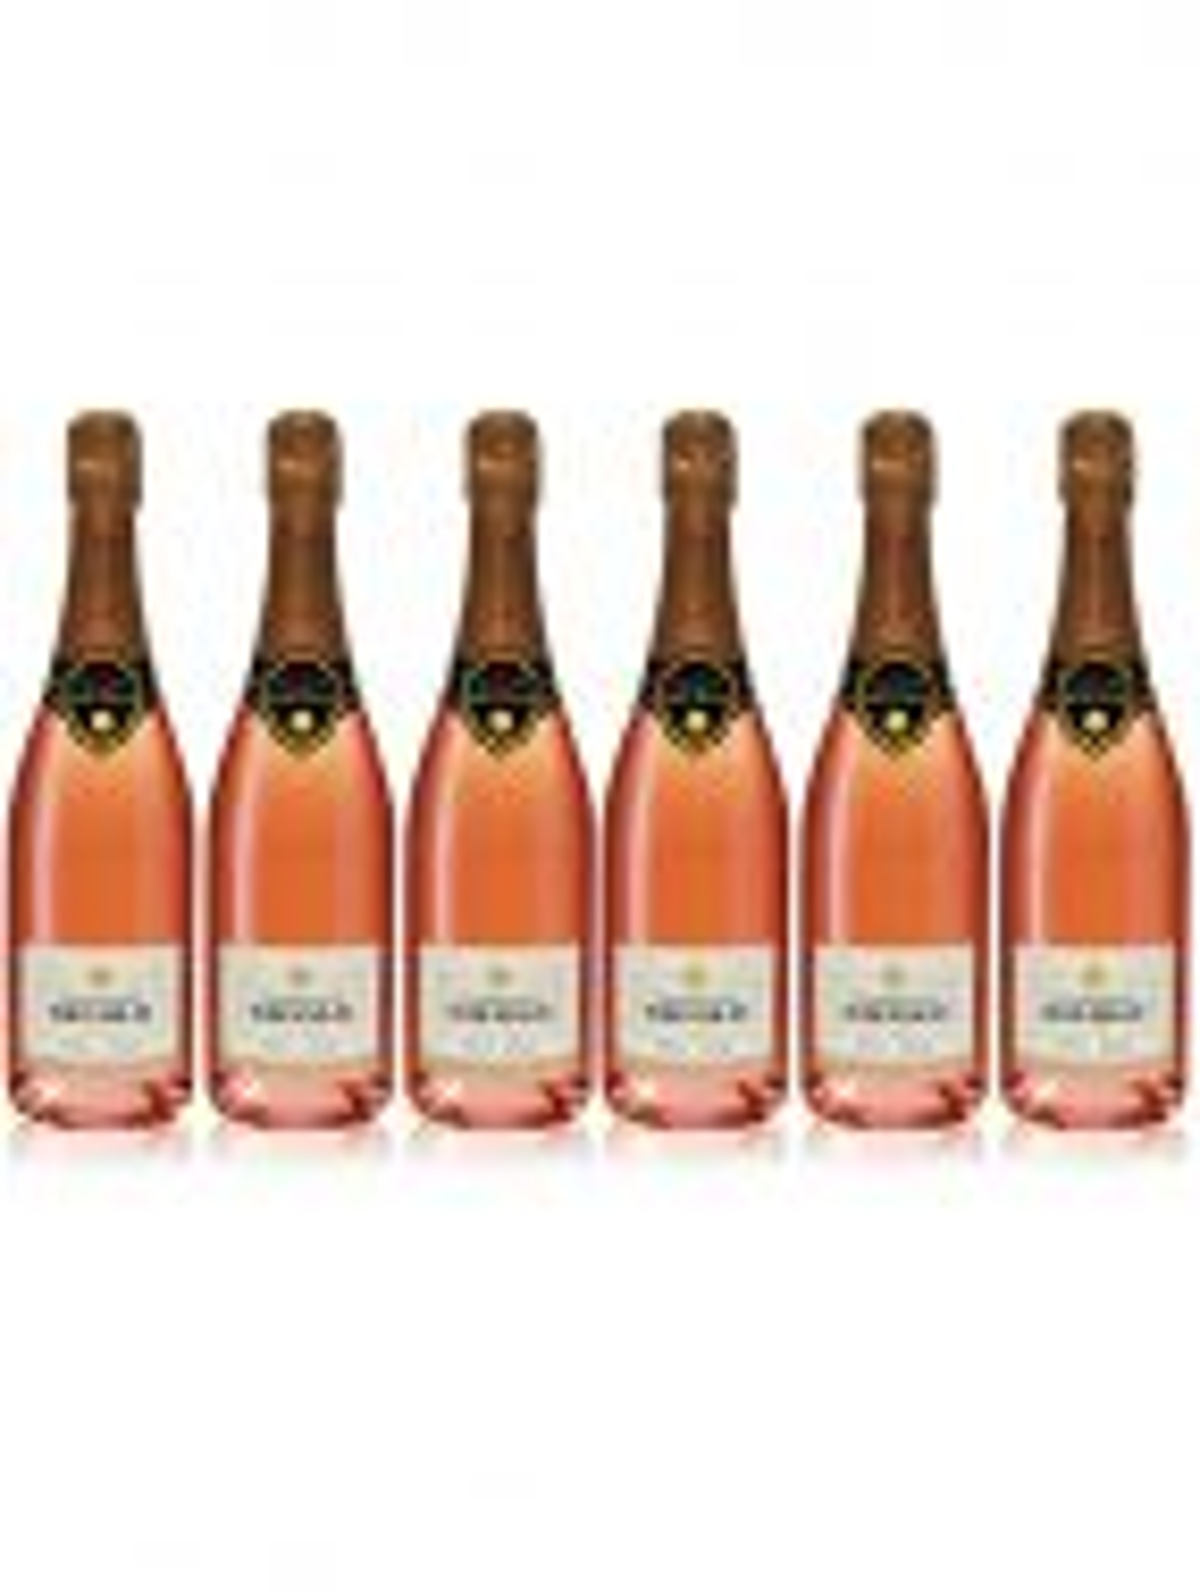 Nicolo Brut Rose Champagne 75cl Case Deal 6 x 75cl